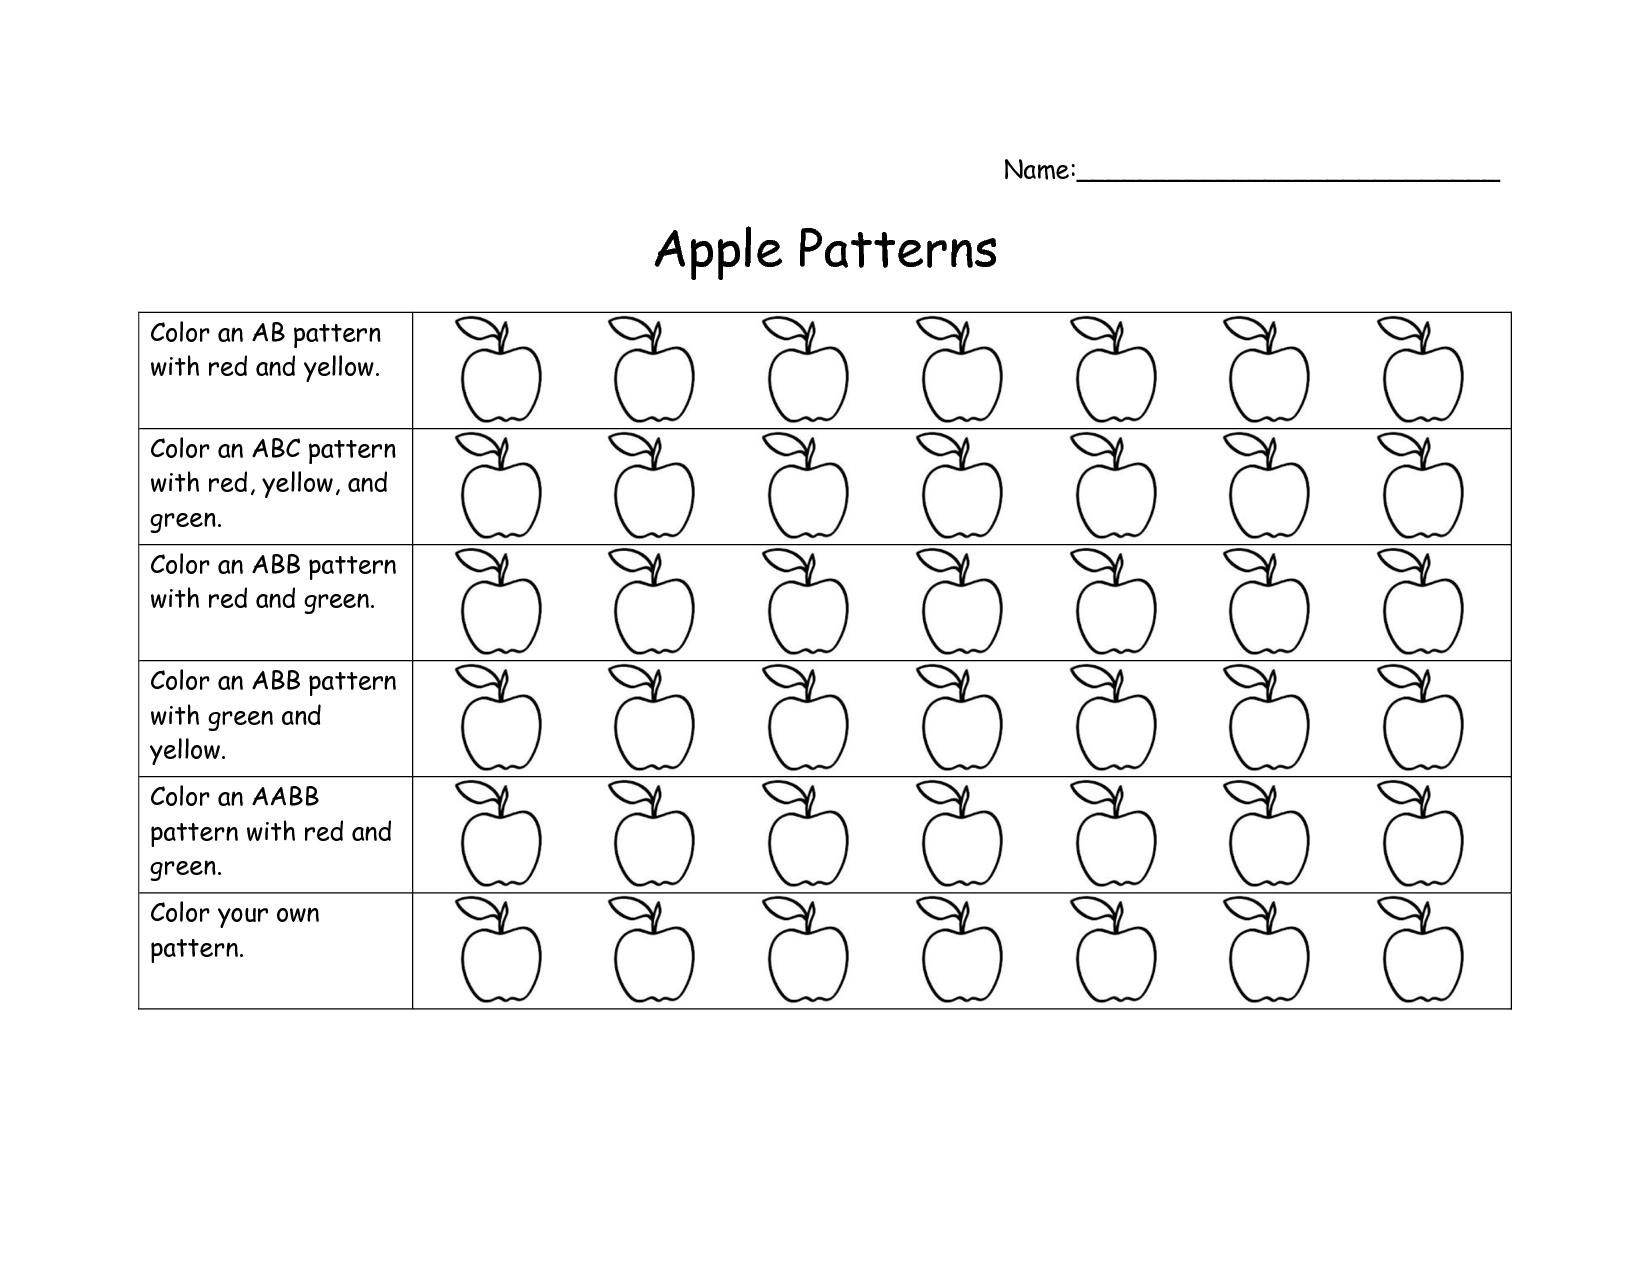 Aabb Patterns Worksheet